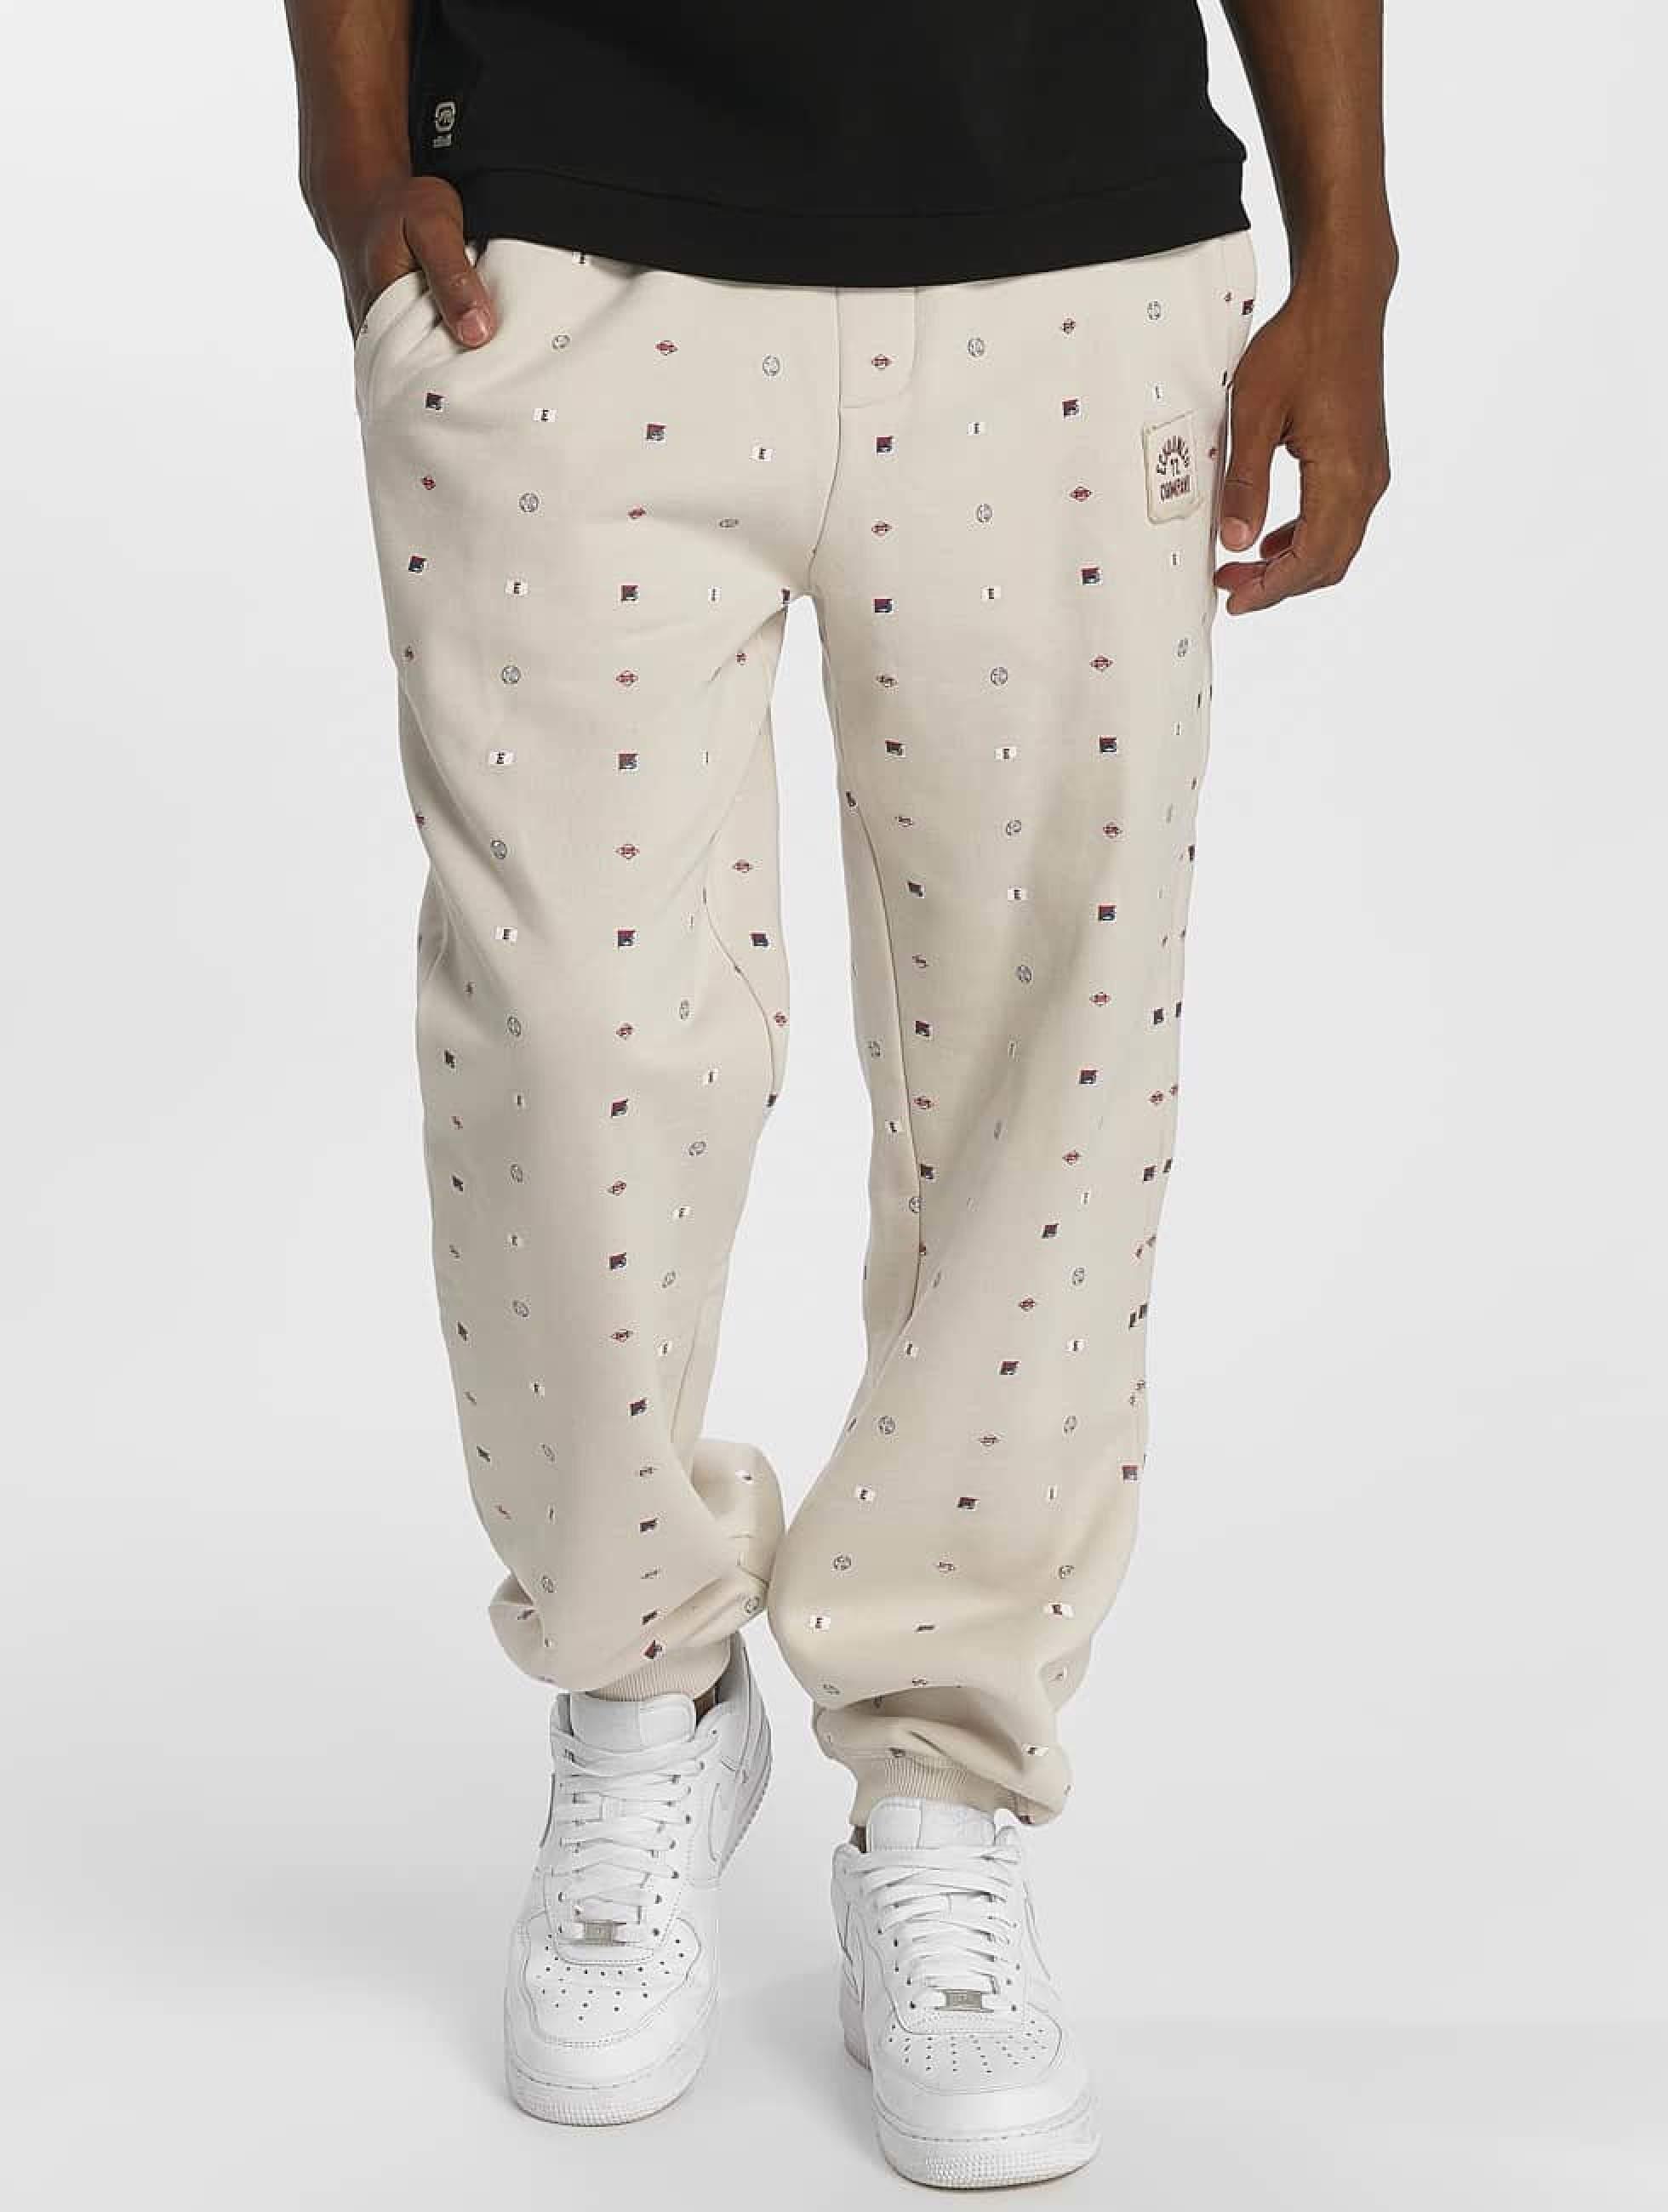 Ecko Unltd. / Sweat Pant CapeVidal in white 3XL